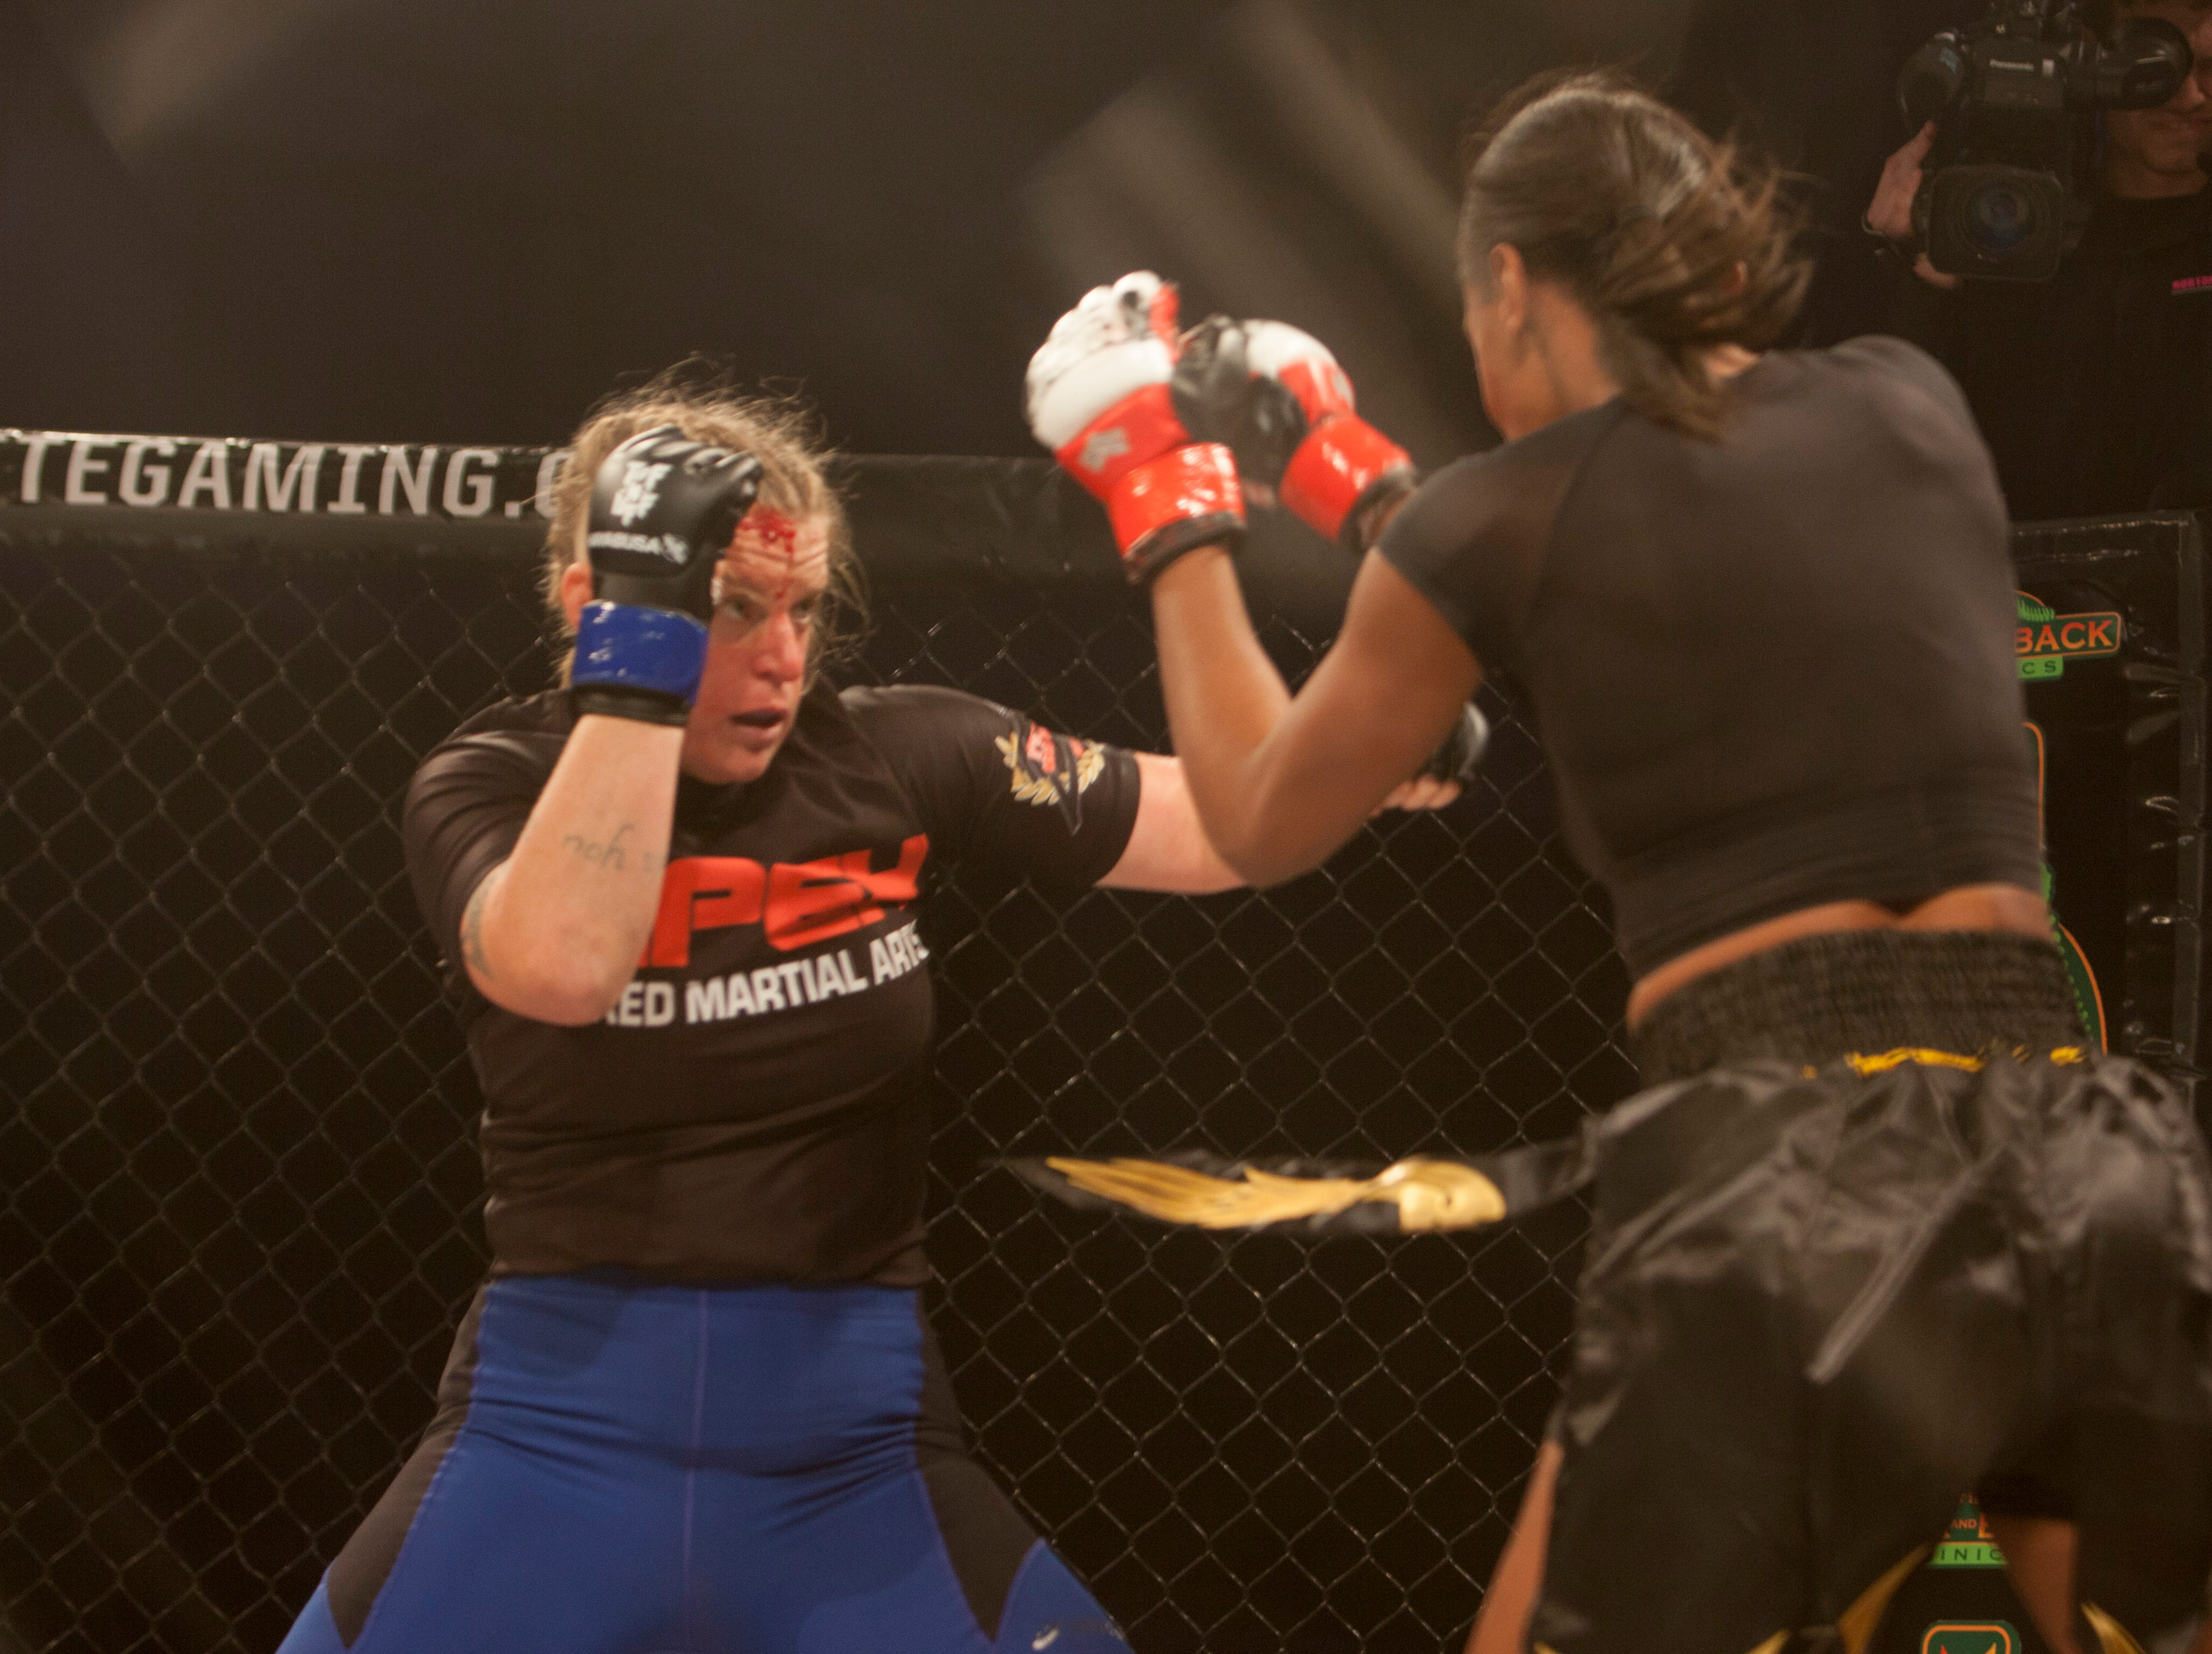 Elizabeth McMullin, in the blue corner, defeats Brandi Buckley during Mayhem in Mesquite at the Casablanca Saturday, Dec. 15, 2018.